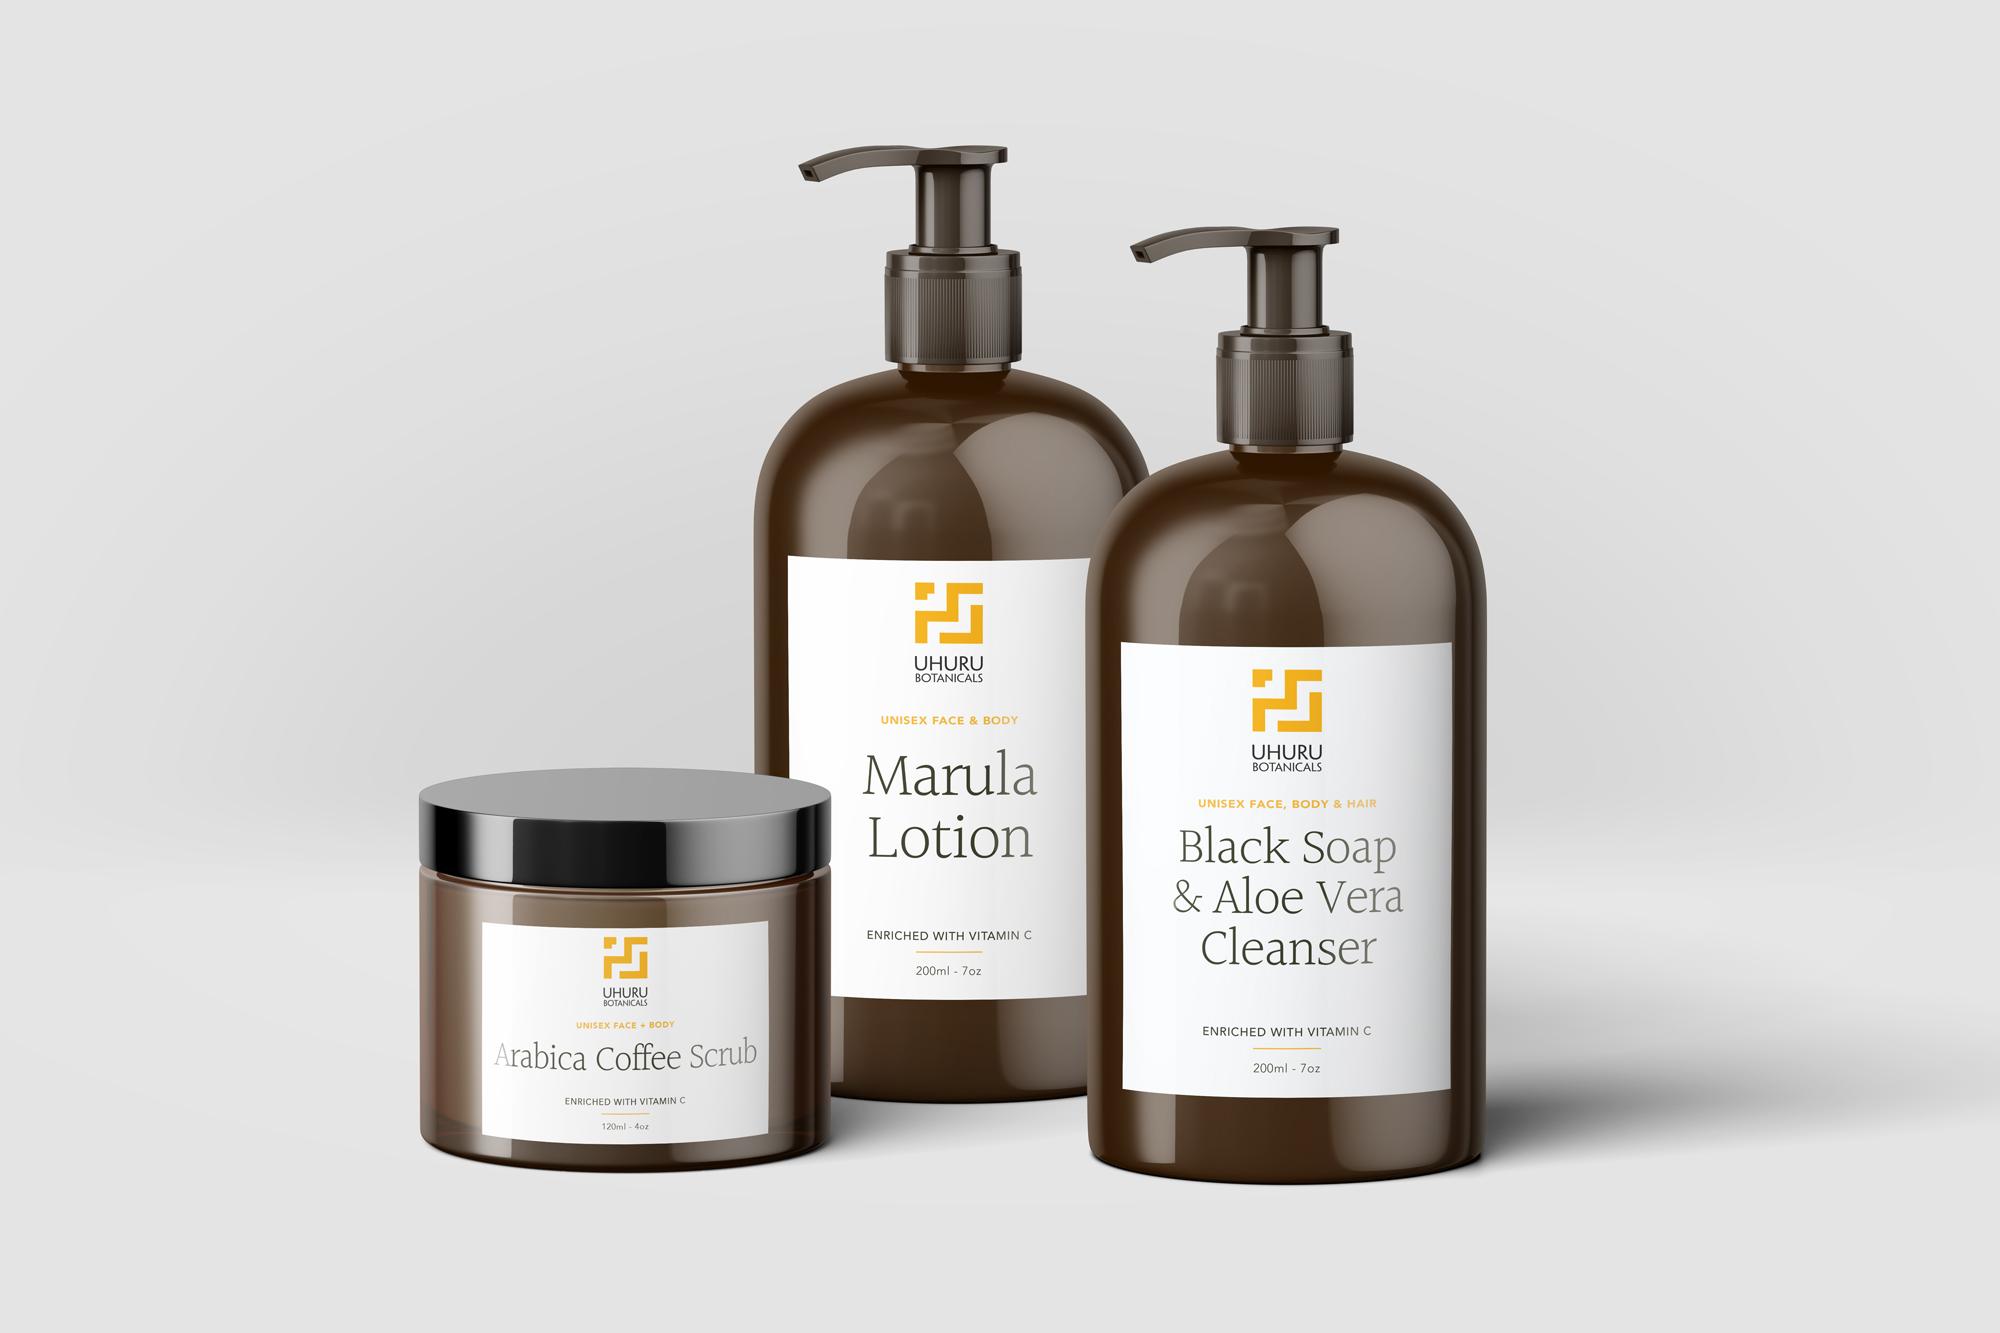 uhuru-botanicals-label-packaging-design-studio-77-london.jpg